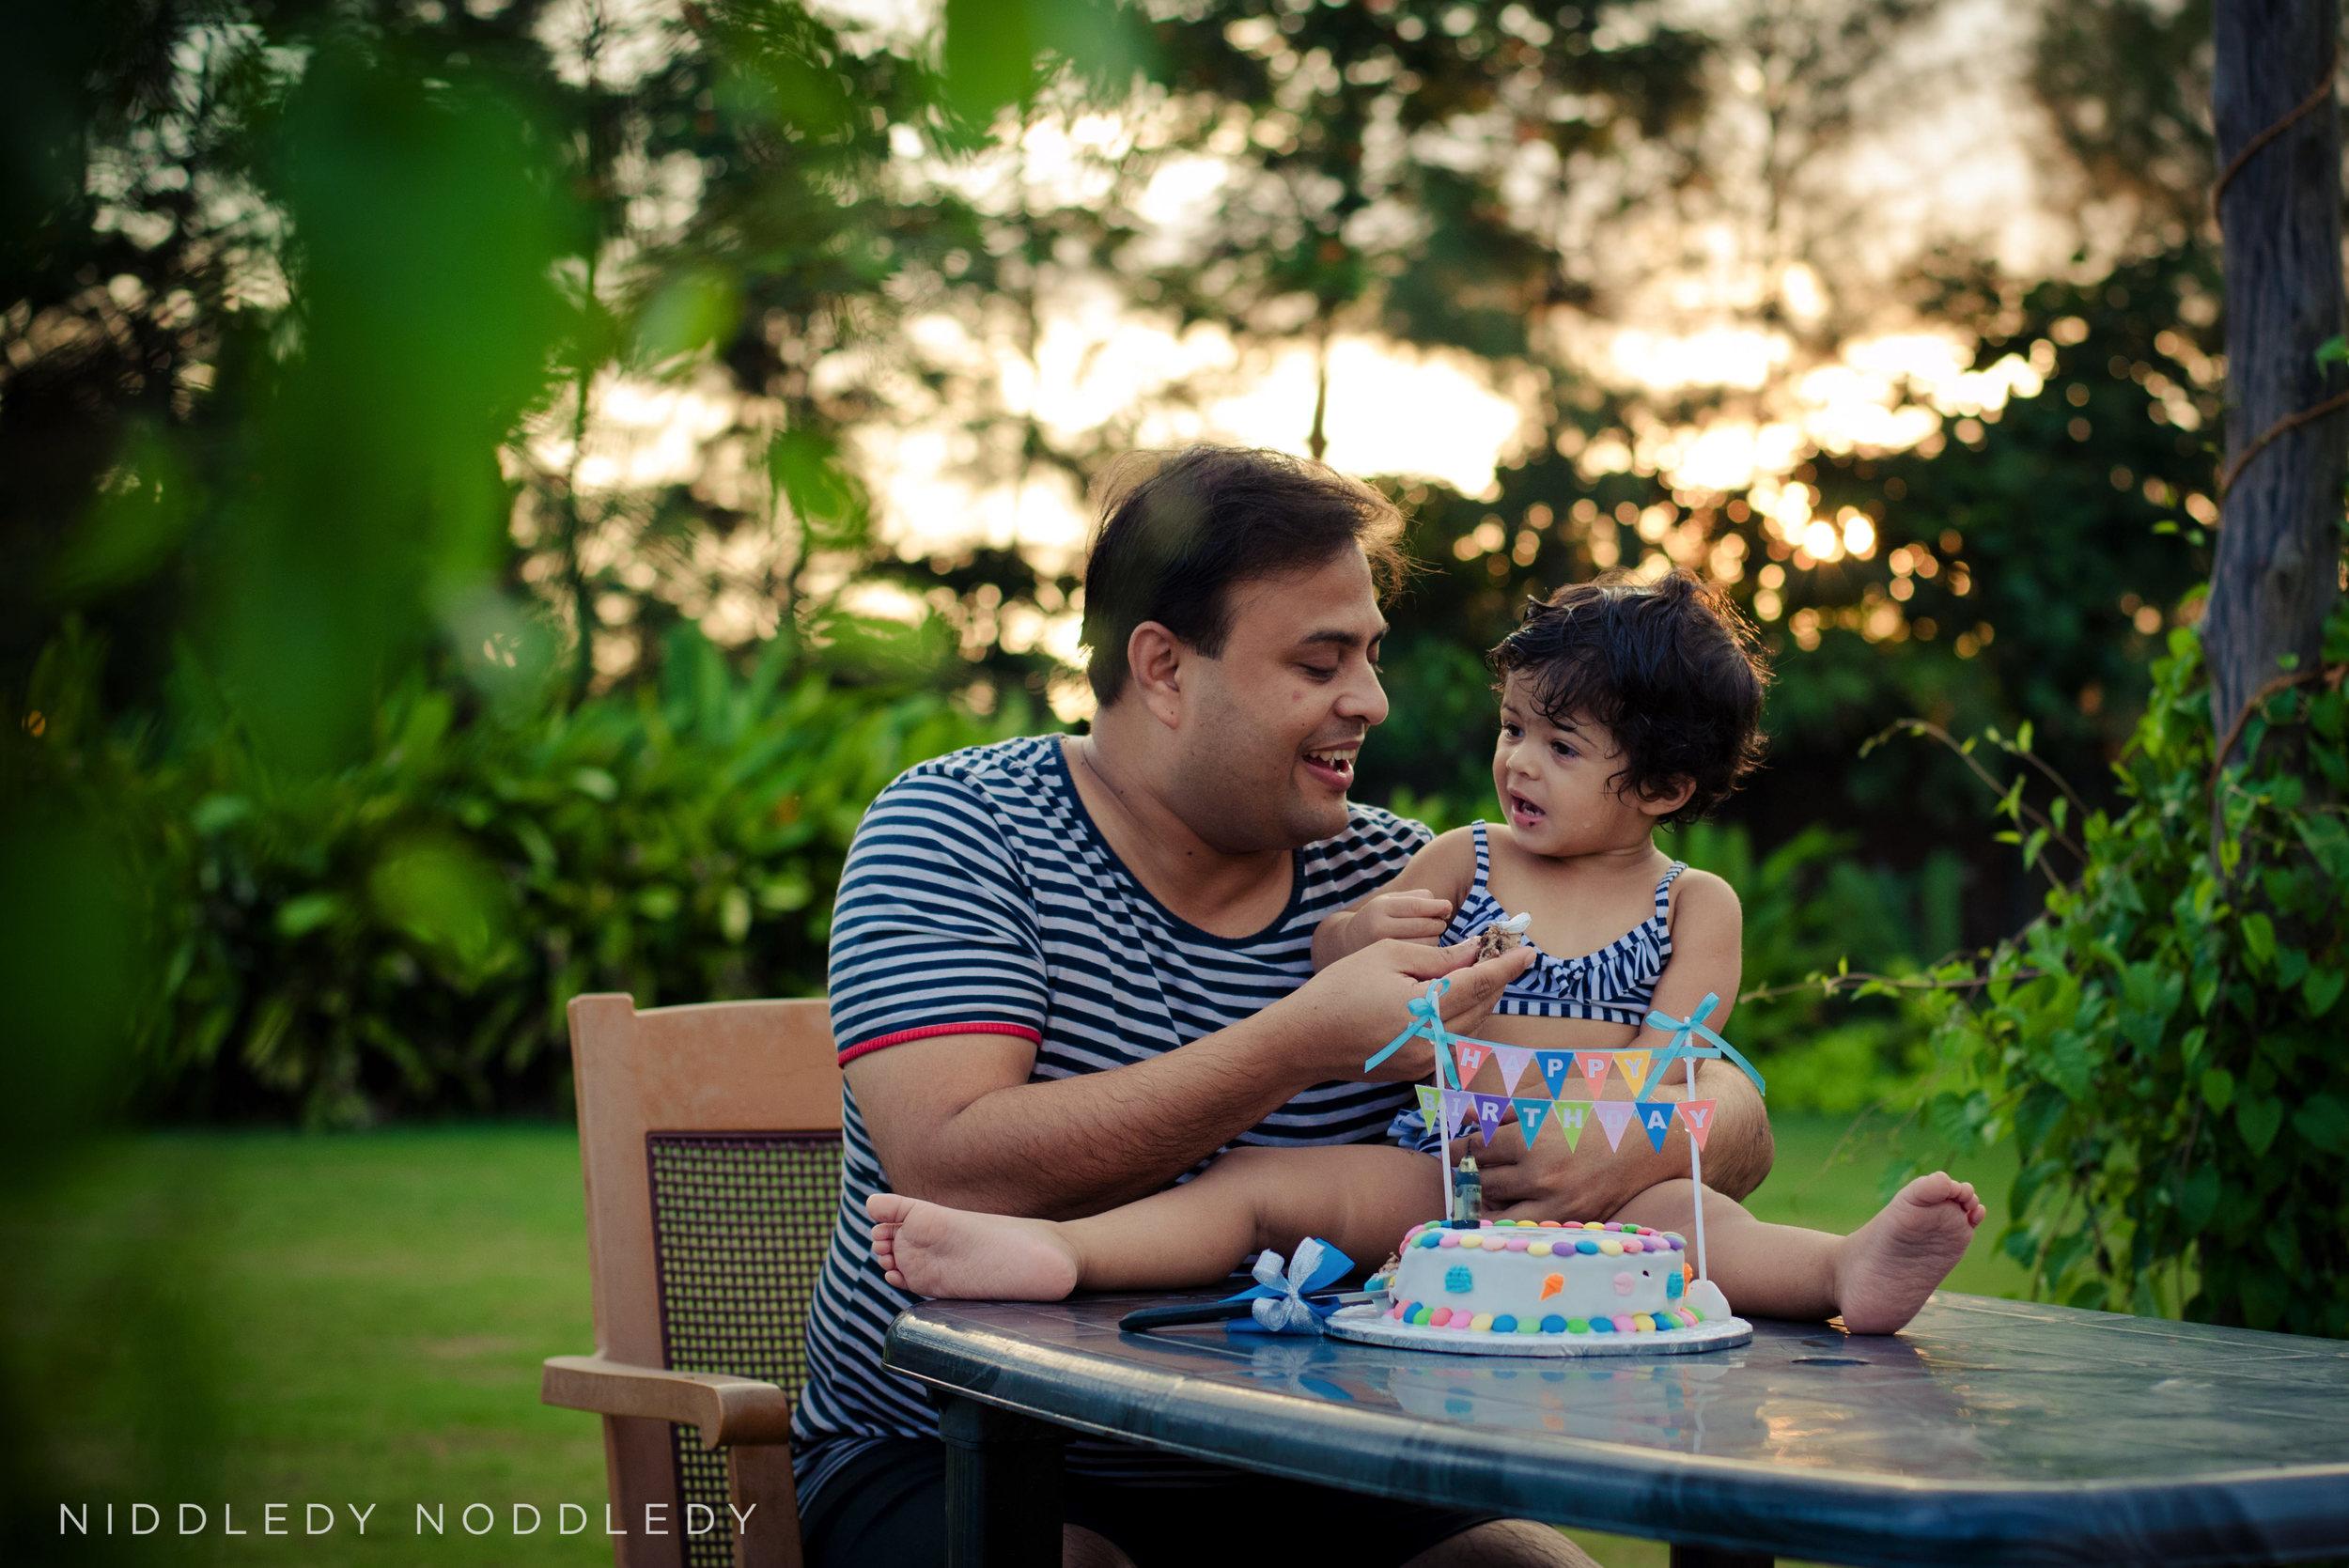 Best Photographer ❤ NiddledyNoddledy.com ~ Prenatal, Newborn and Child Photography, Calcutta - 05.jpg